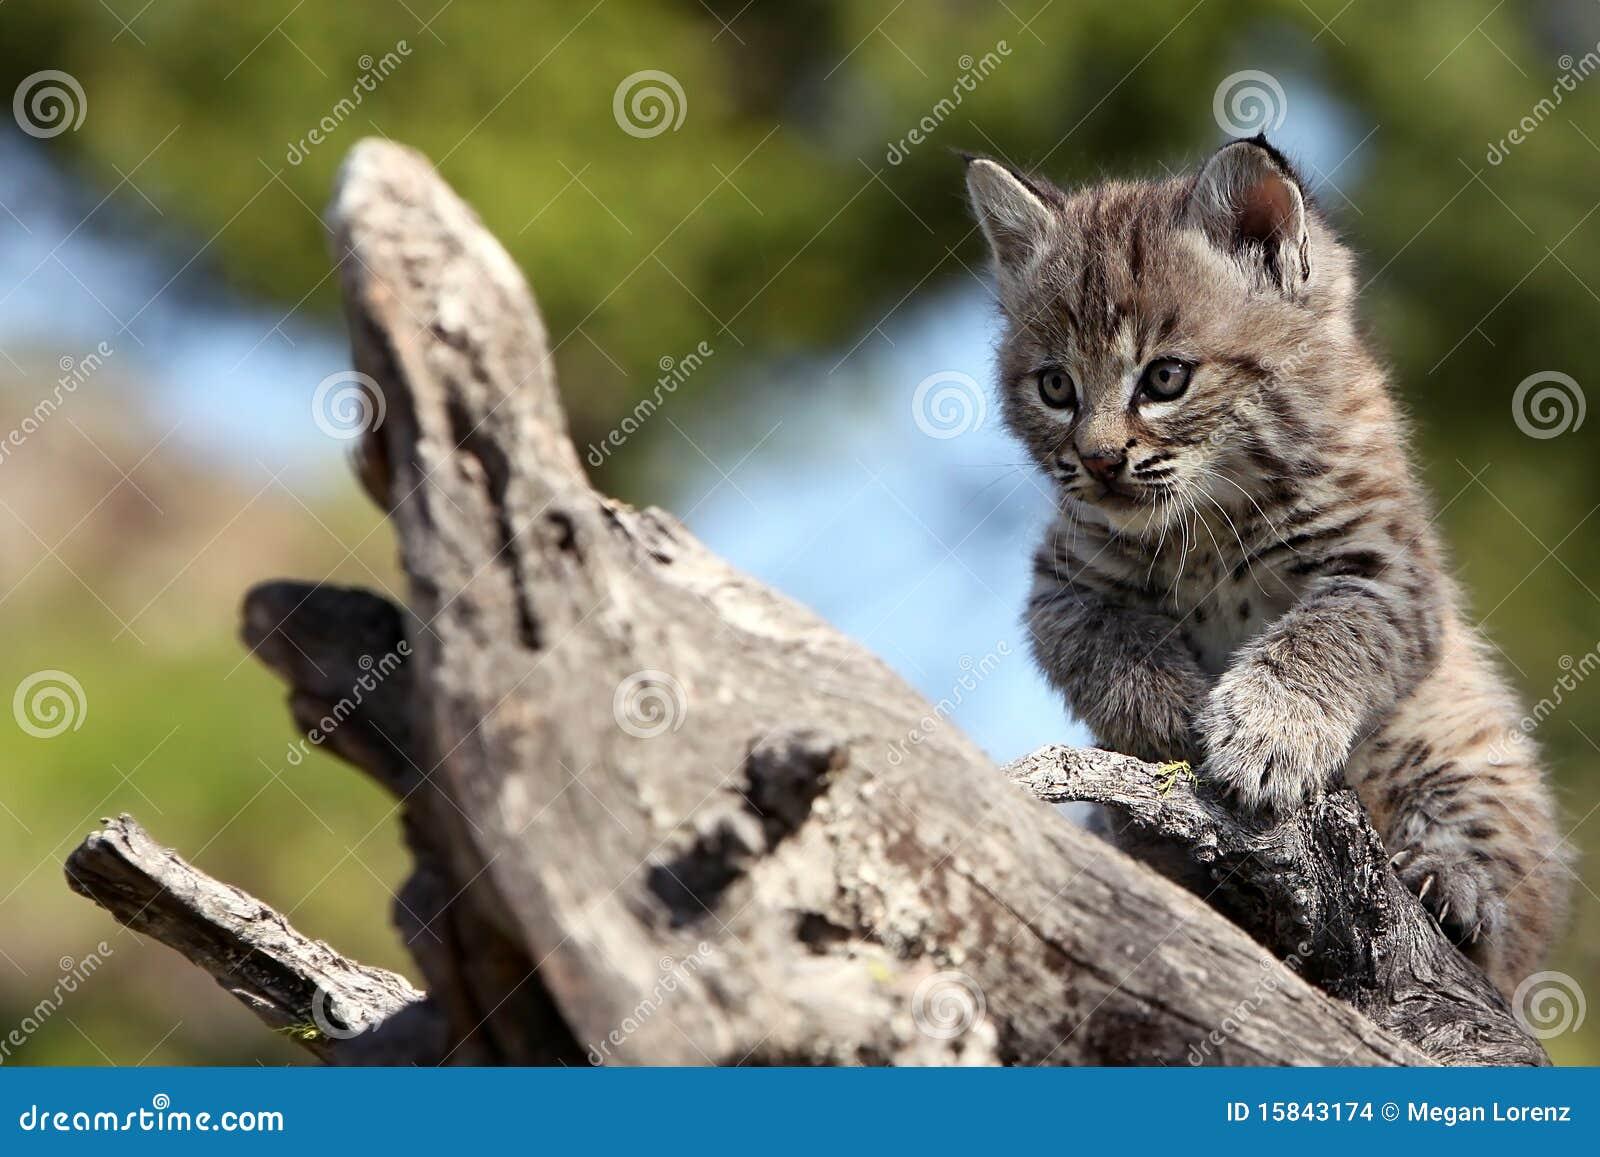 Bobcat Kittens In The Wild